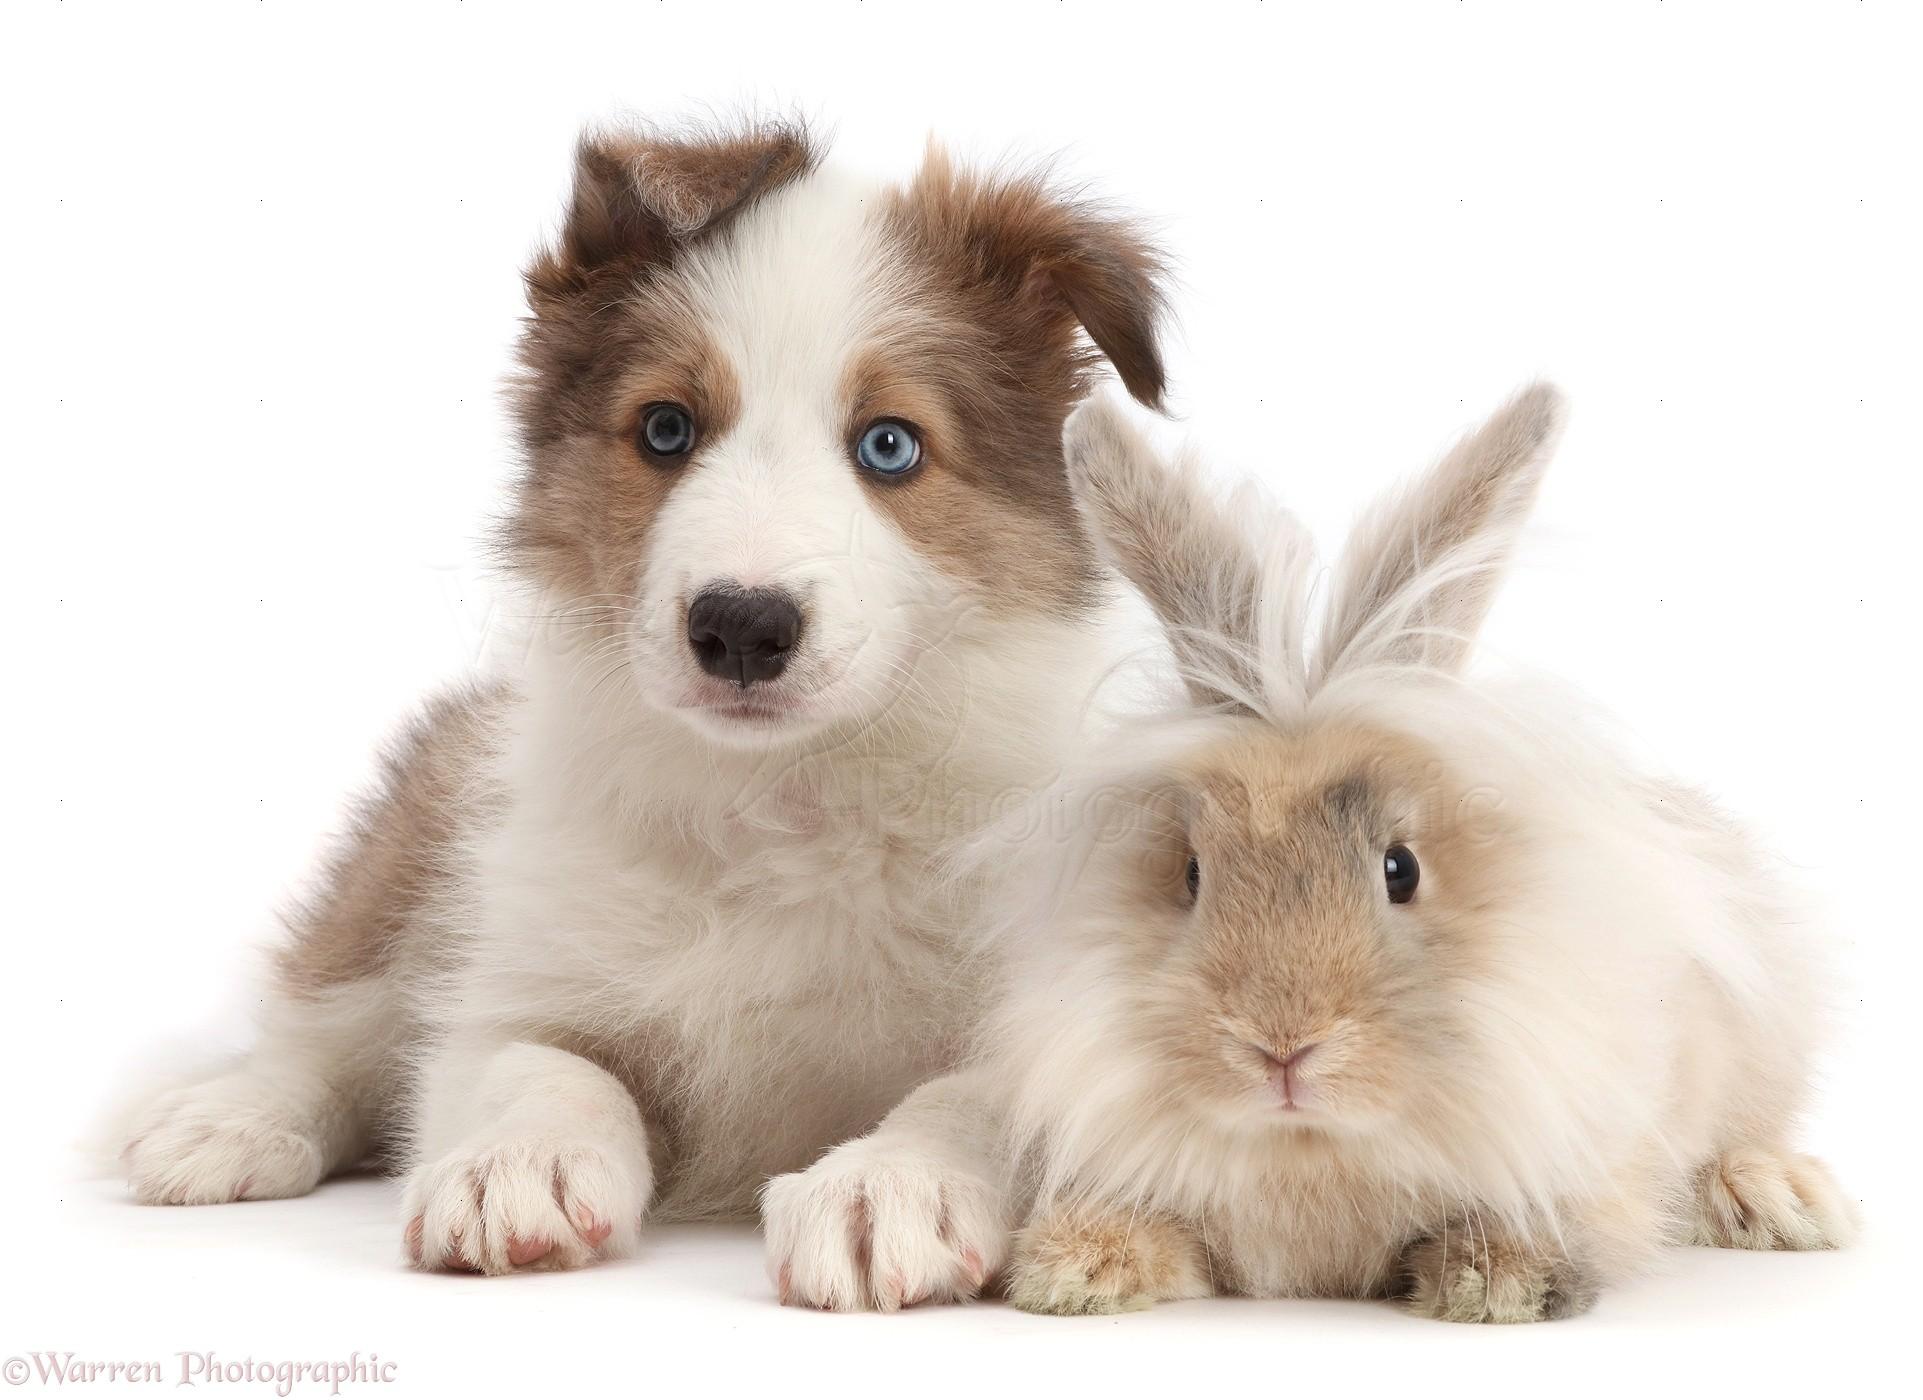 Fluffy Pet Dogs